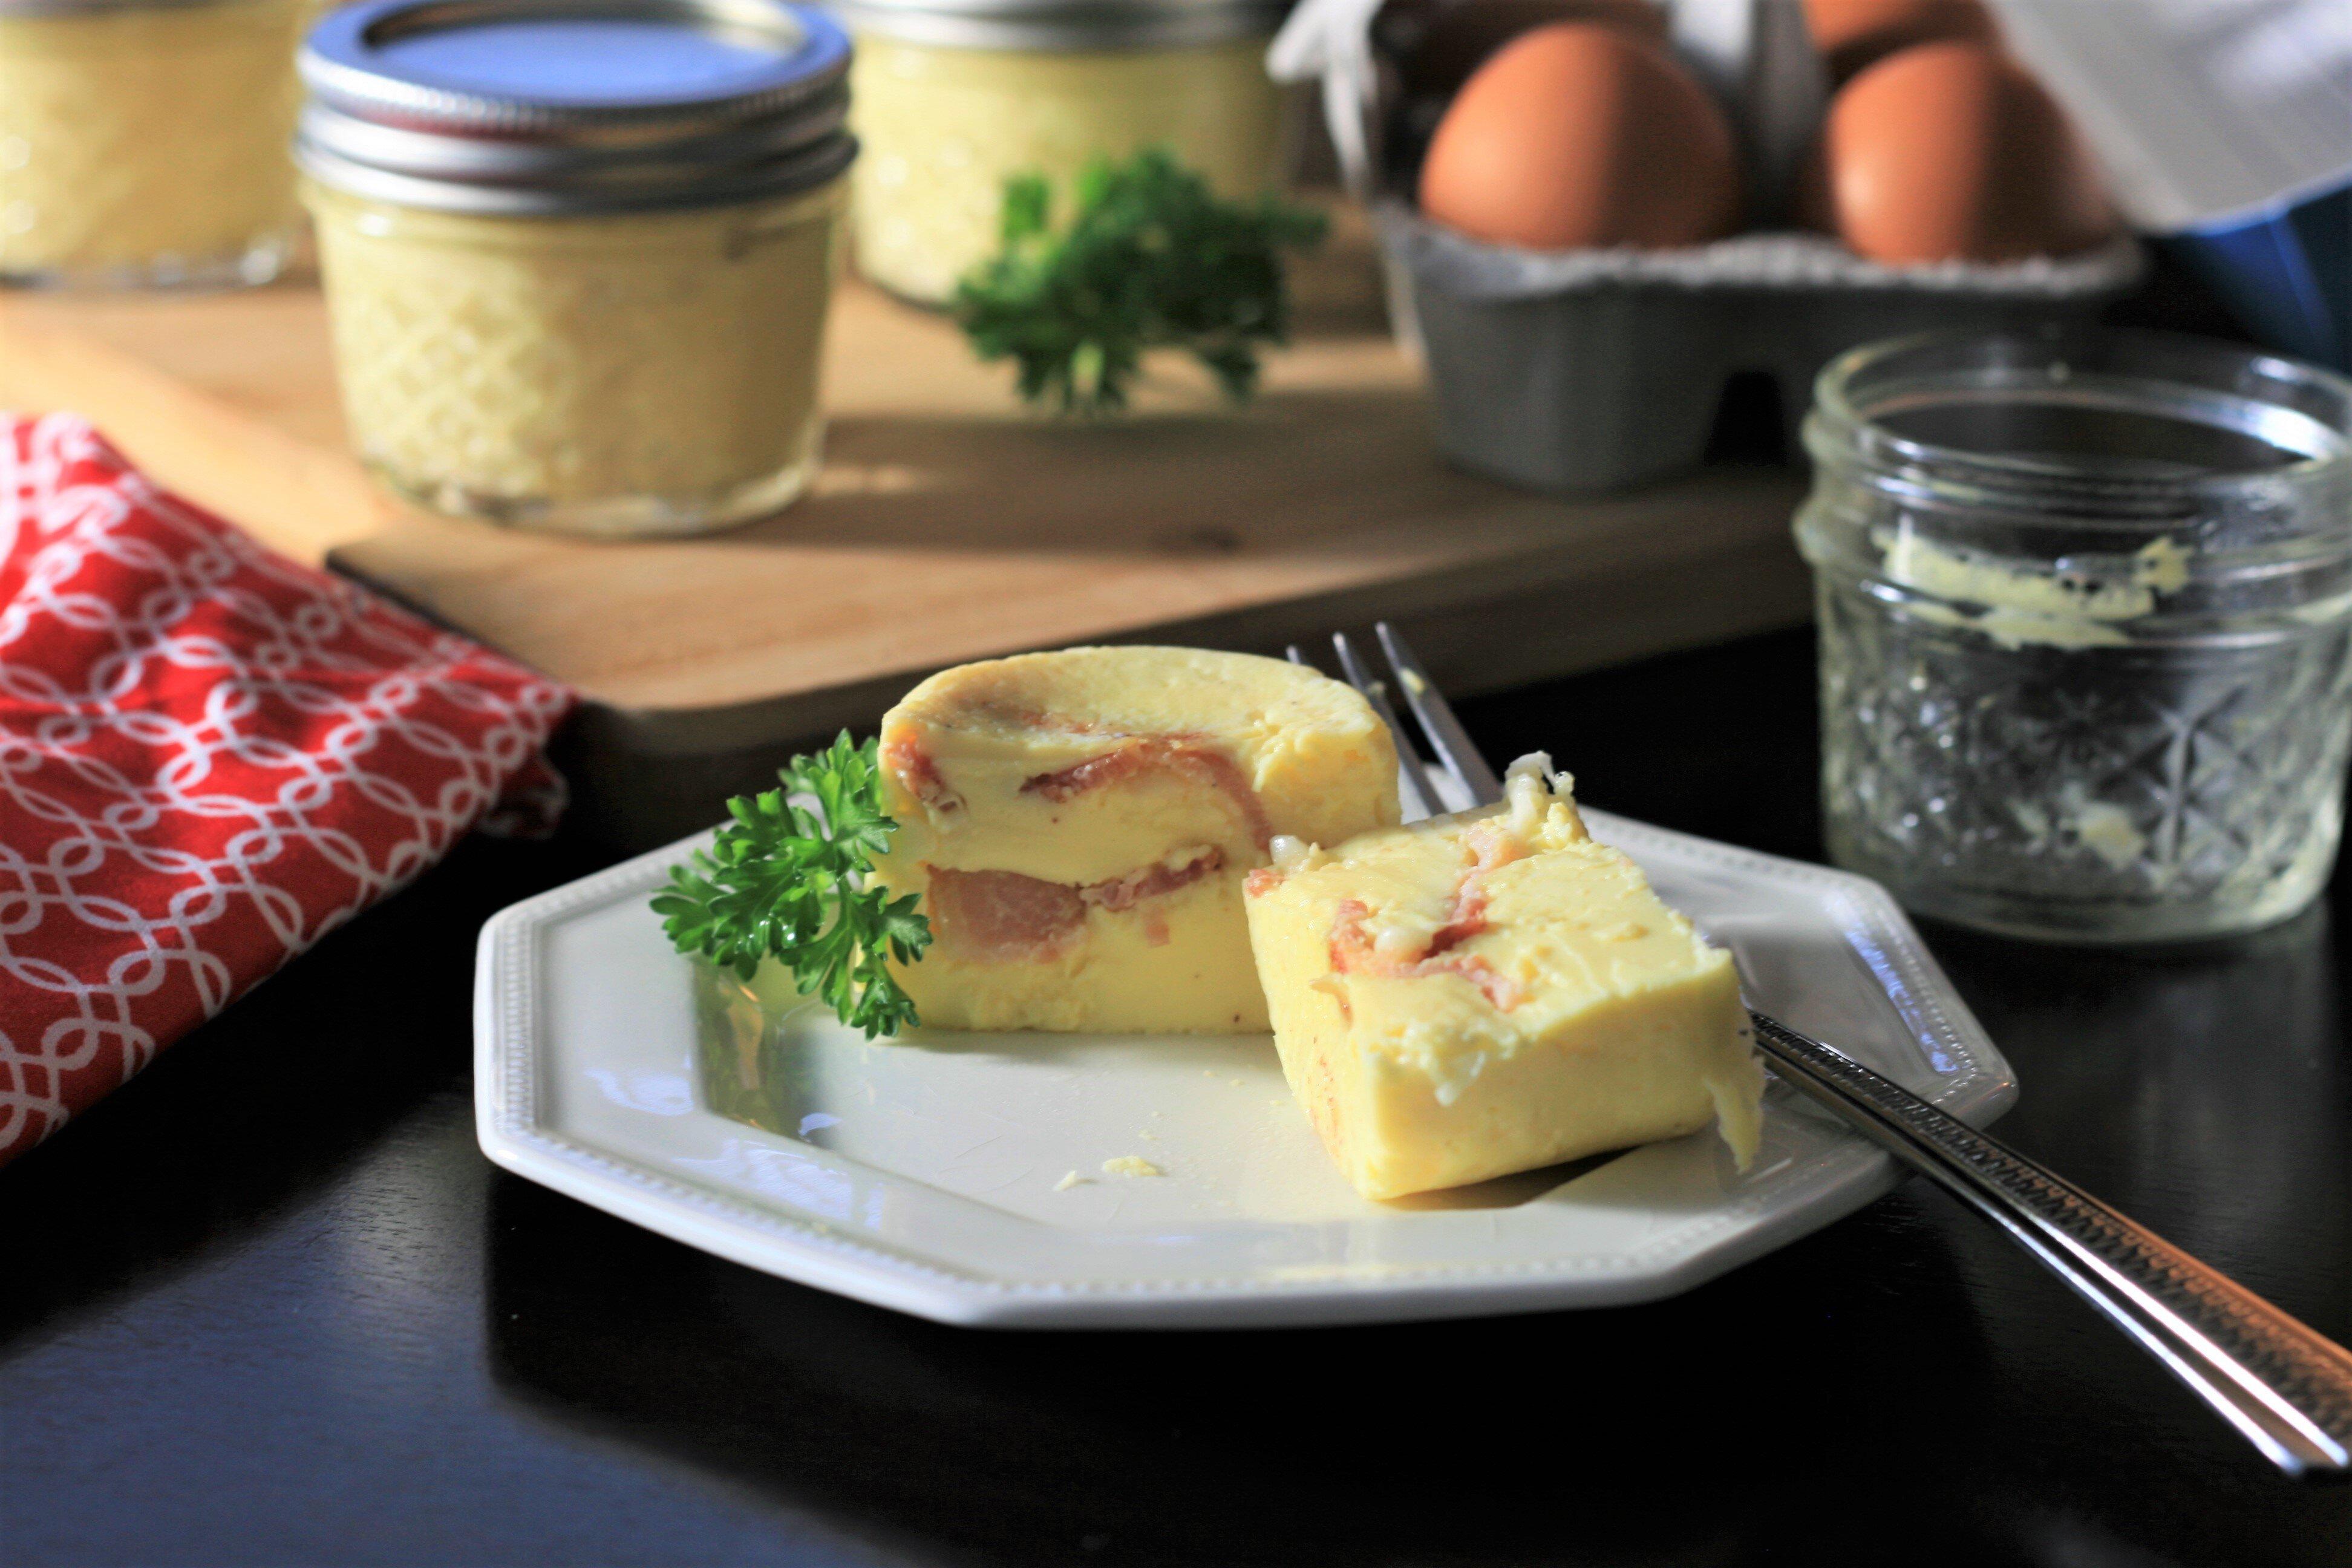 bacon and gruyere sous vide egg bites recipe